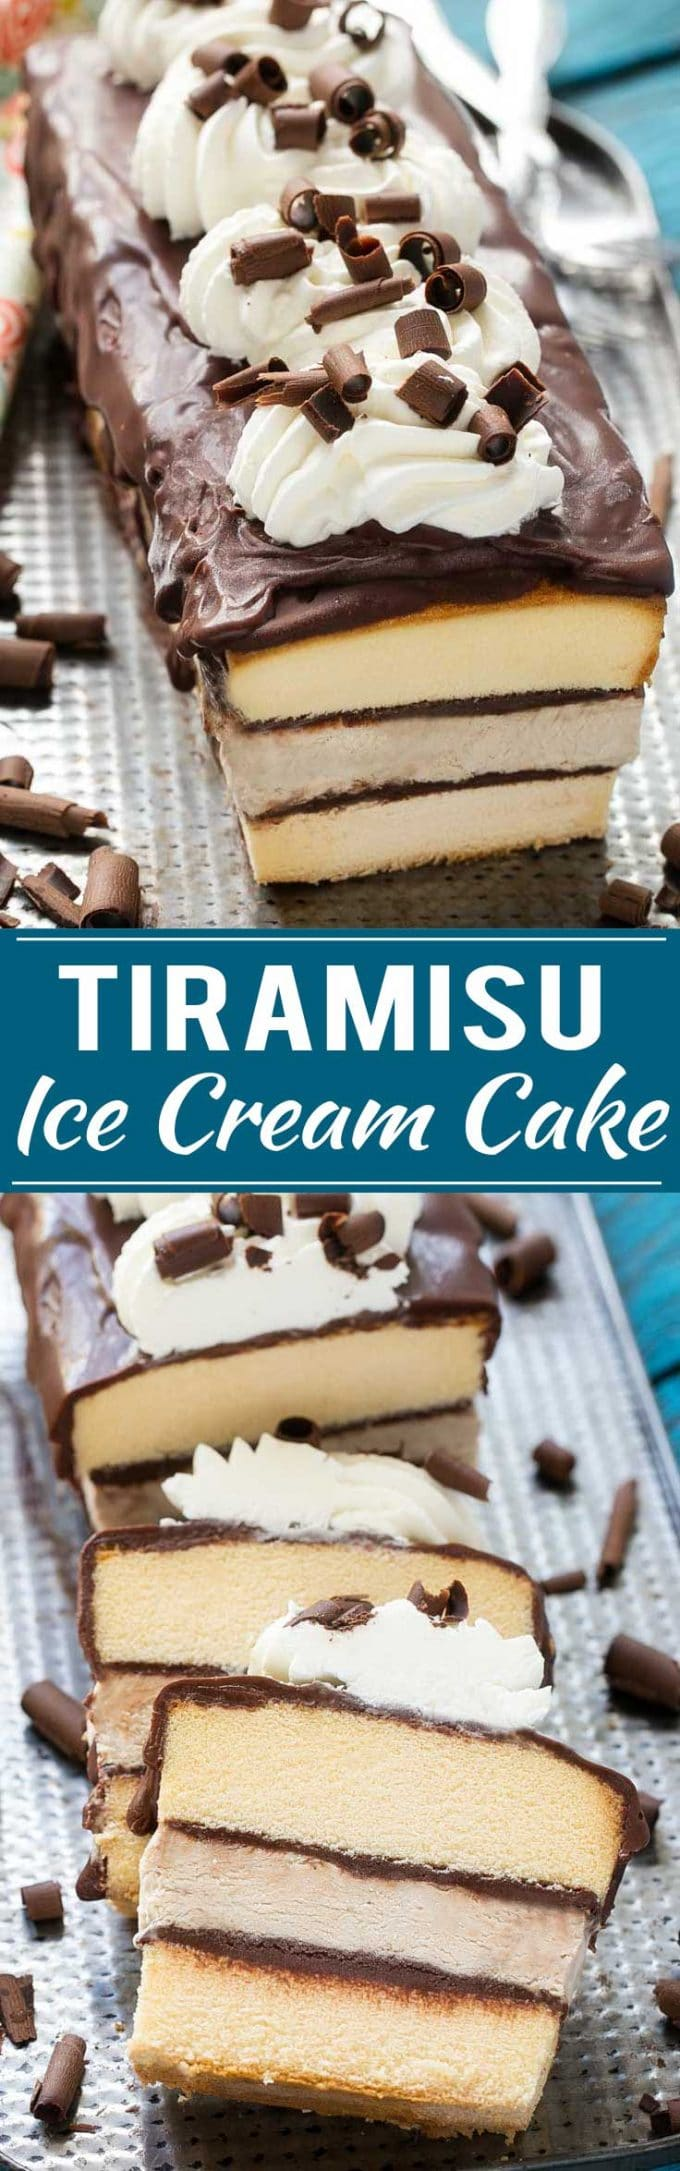 Tiramisu Ice Cream Cake Recipe | Tiramisu Ice Cream Cake | Tiramisu Ice Cream | Tiramisu Cake | Ice Cream Cake